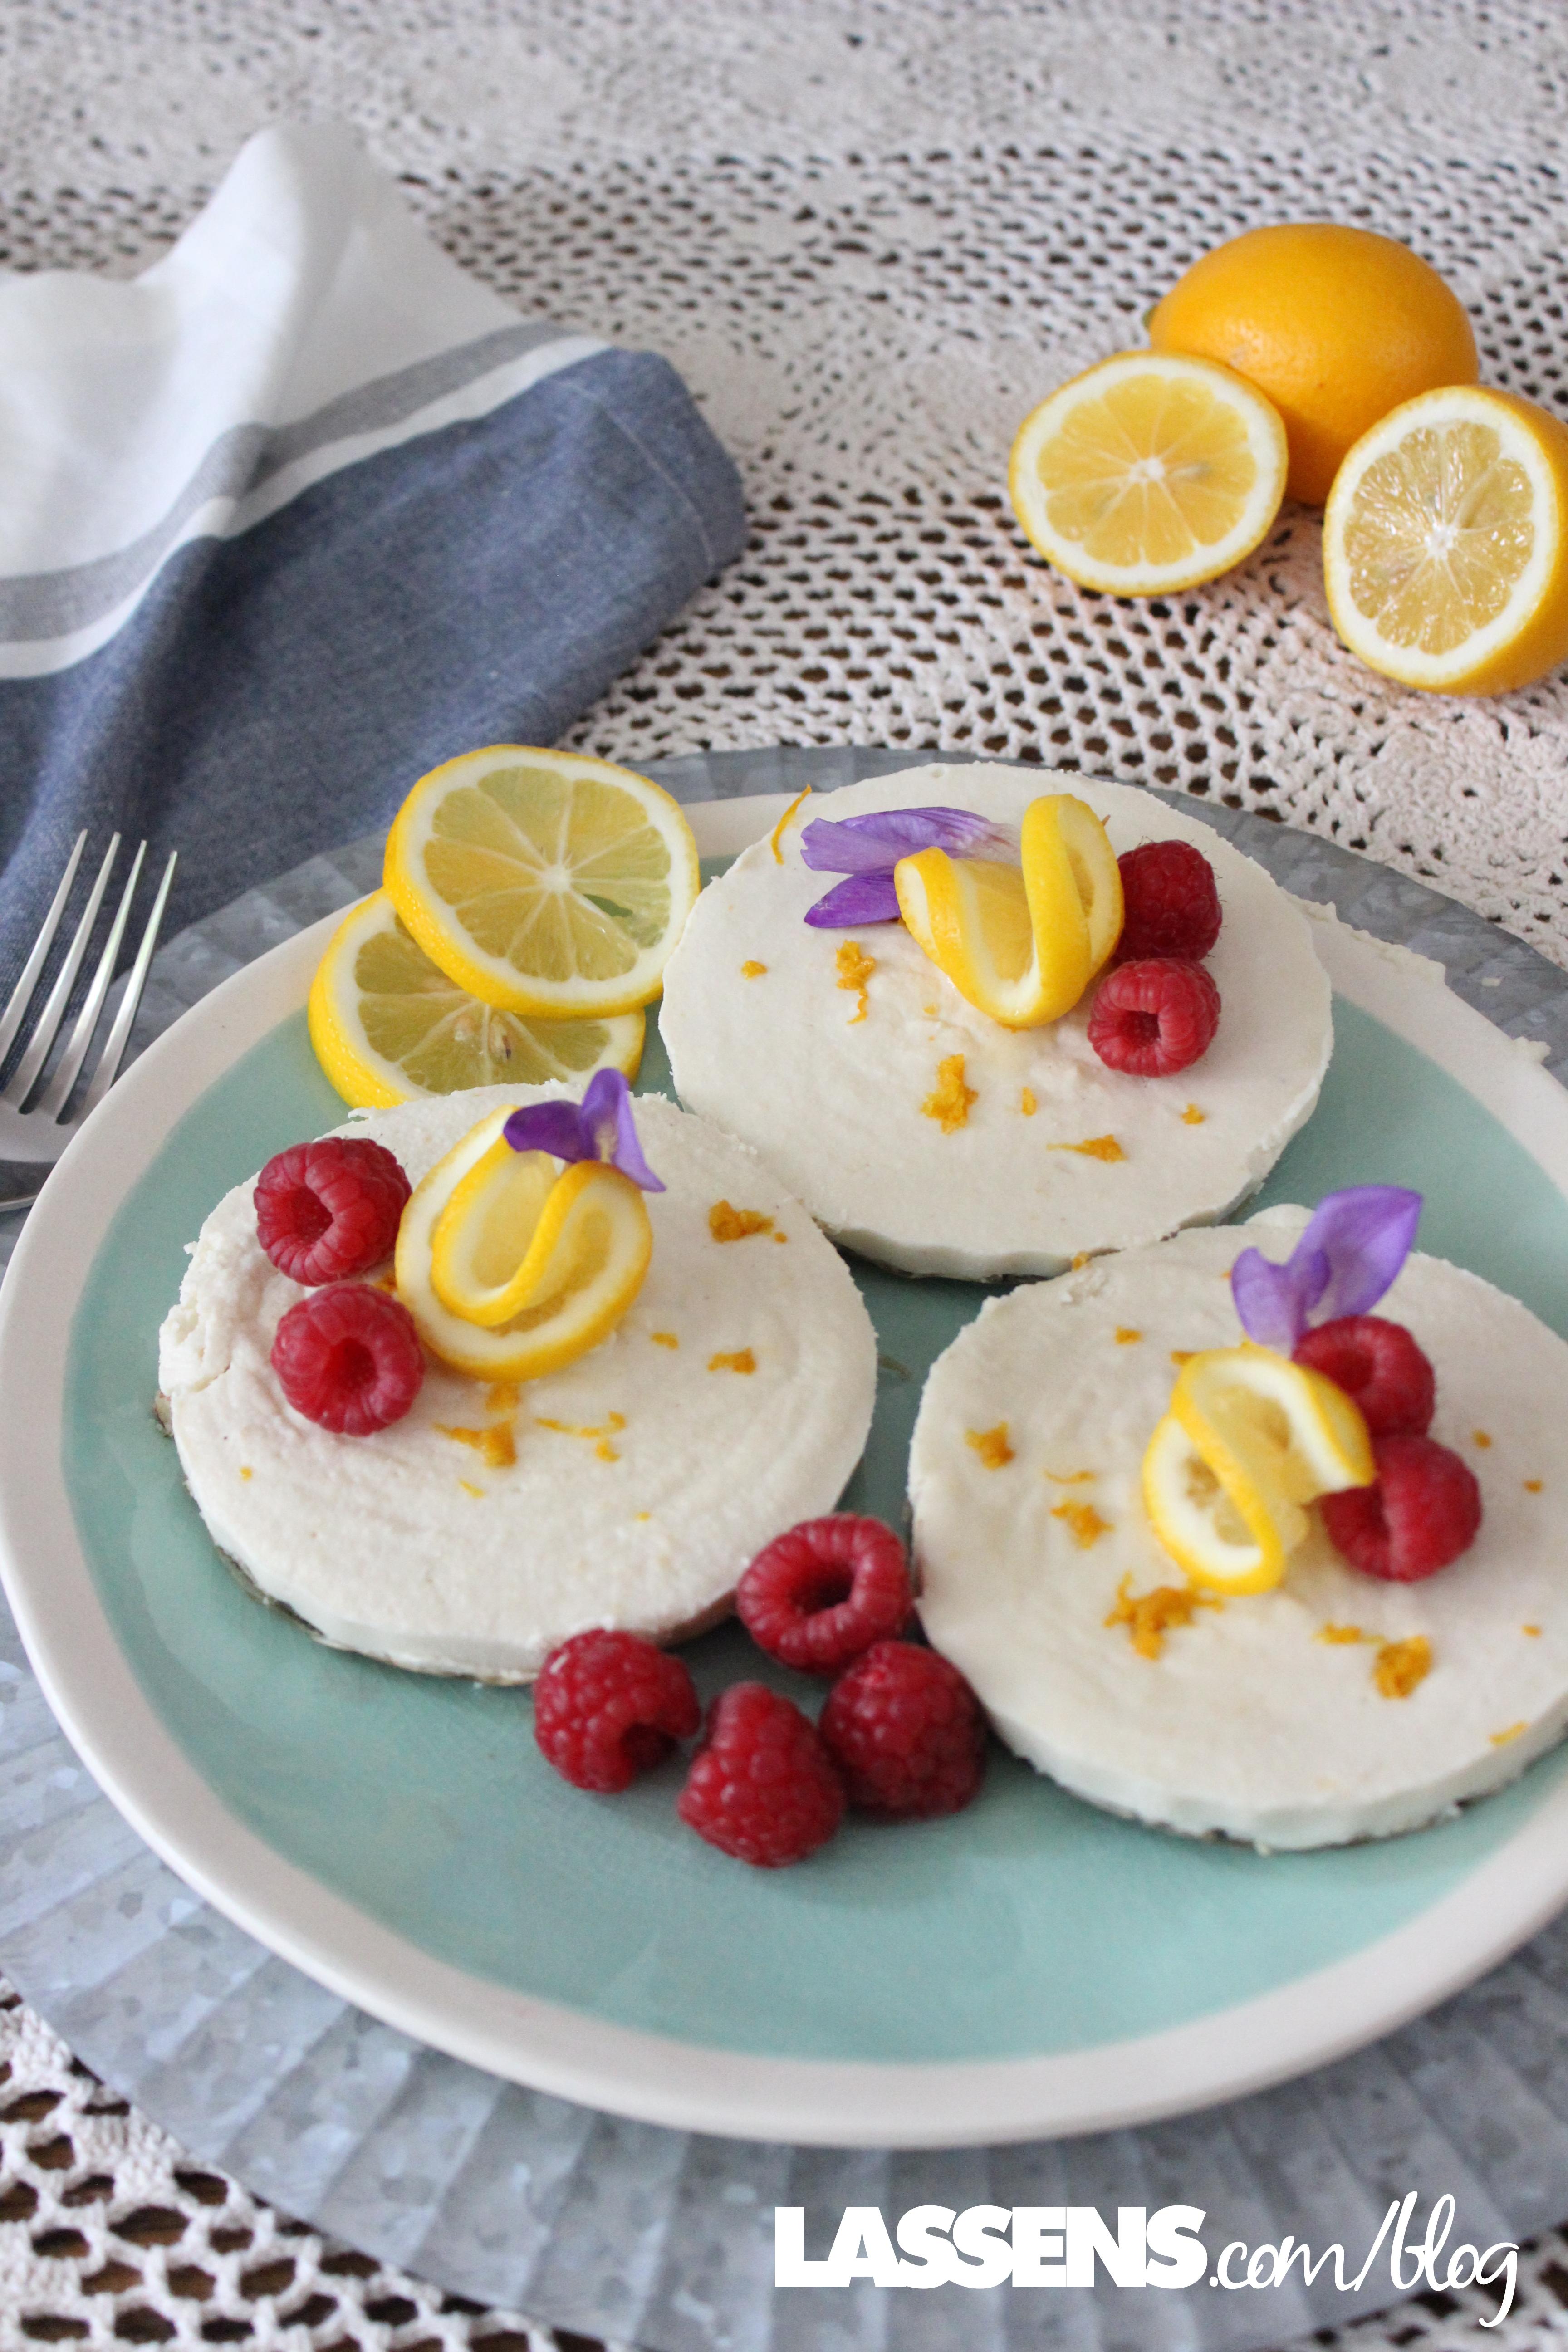 Meyer+lemon+recipes, vegan+cheesecake, lemon+cheesecake, cheesecake+tarts, vegan+cheesecake +arts